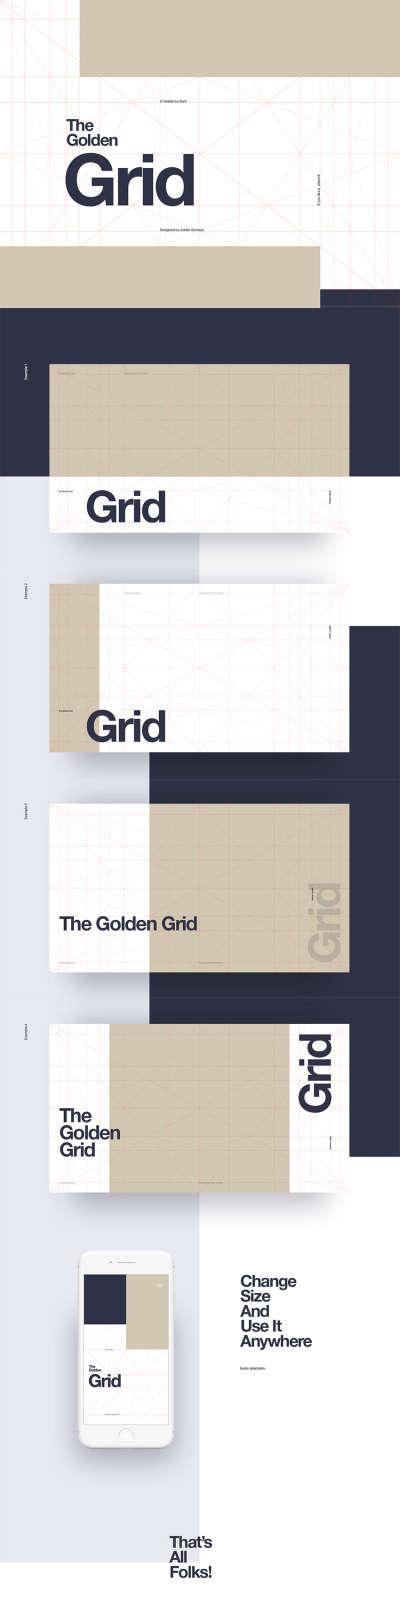 Golden Ratio Grid Freebie